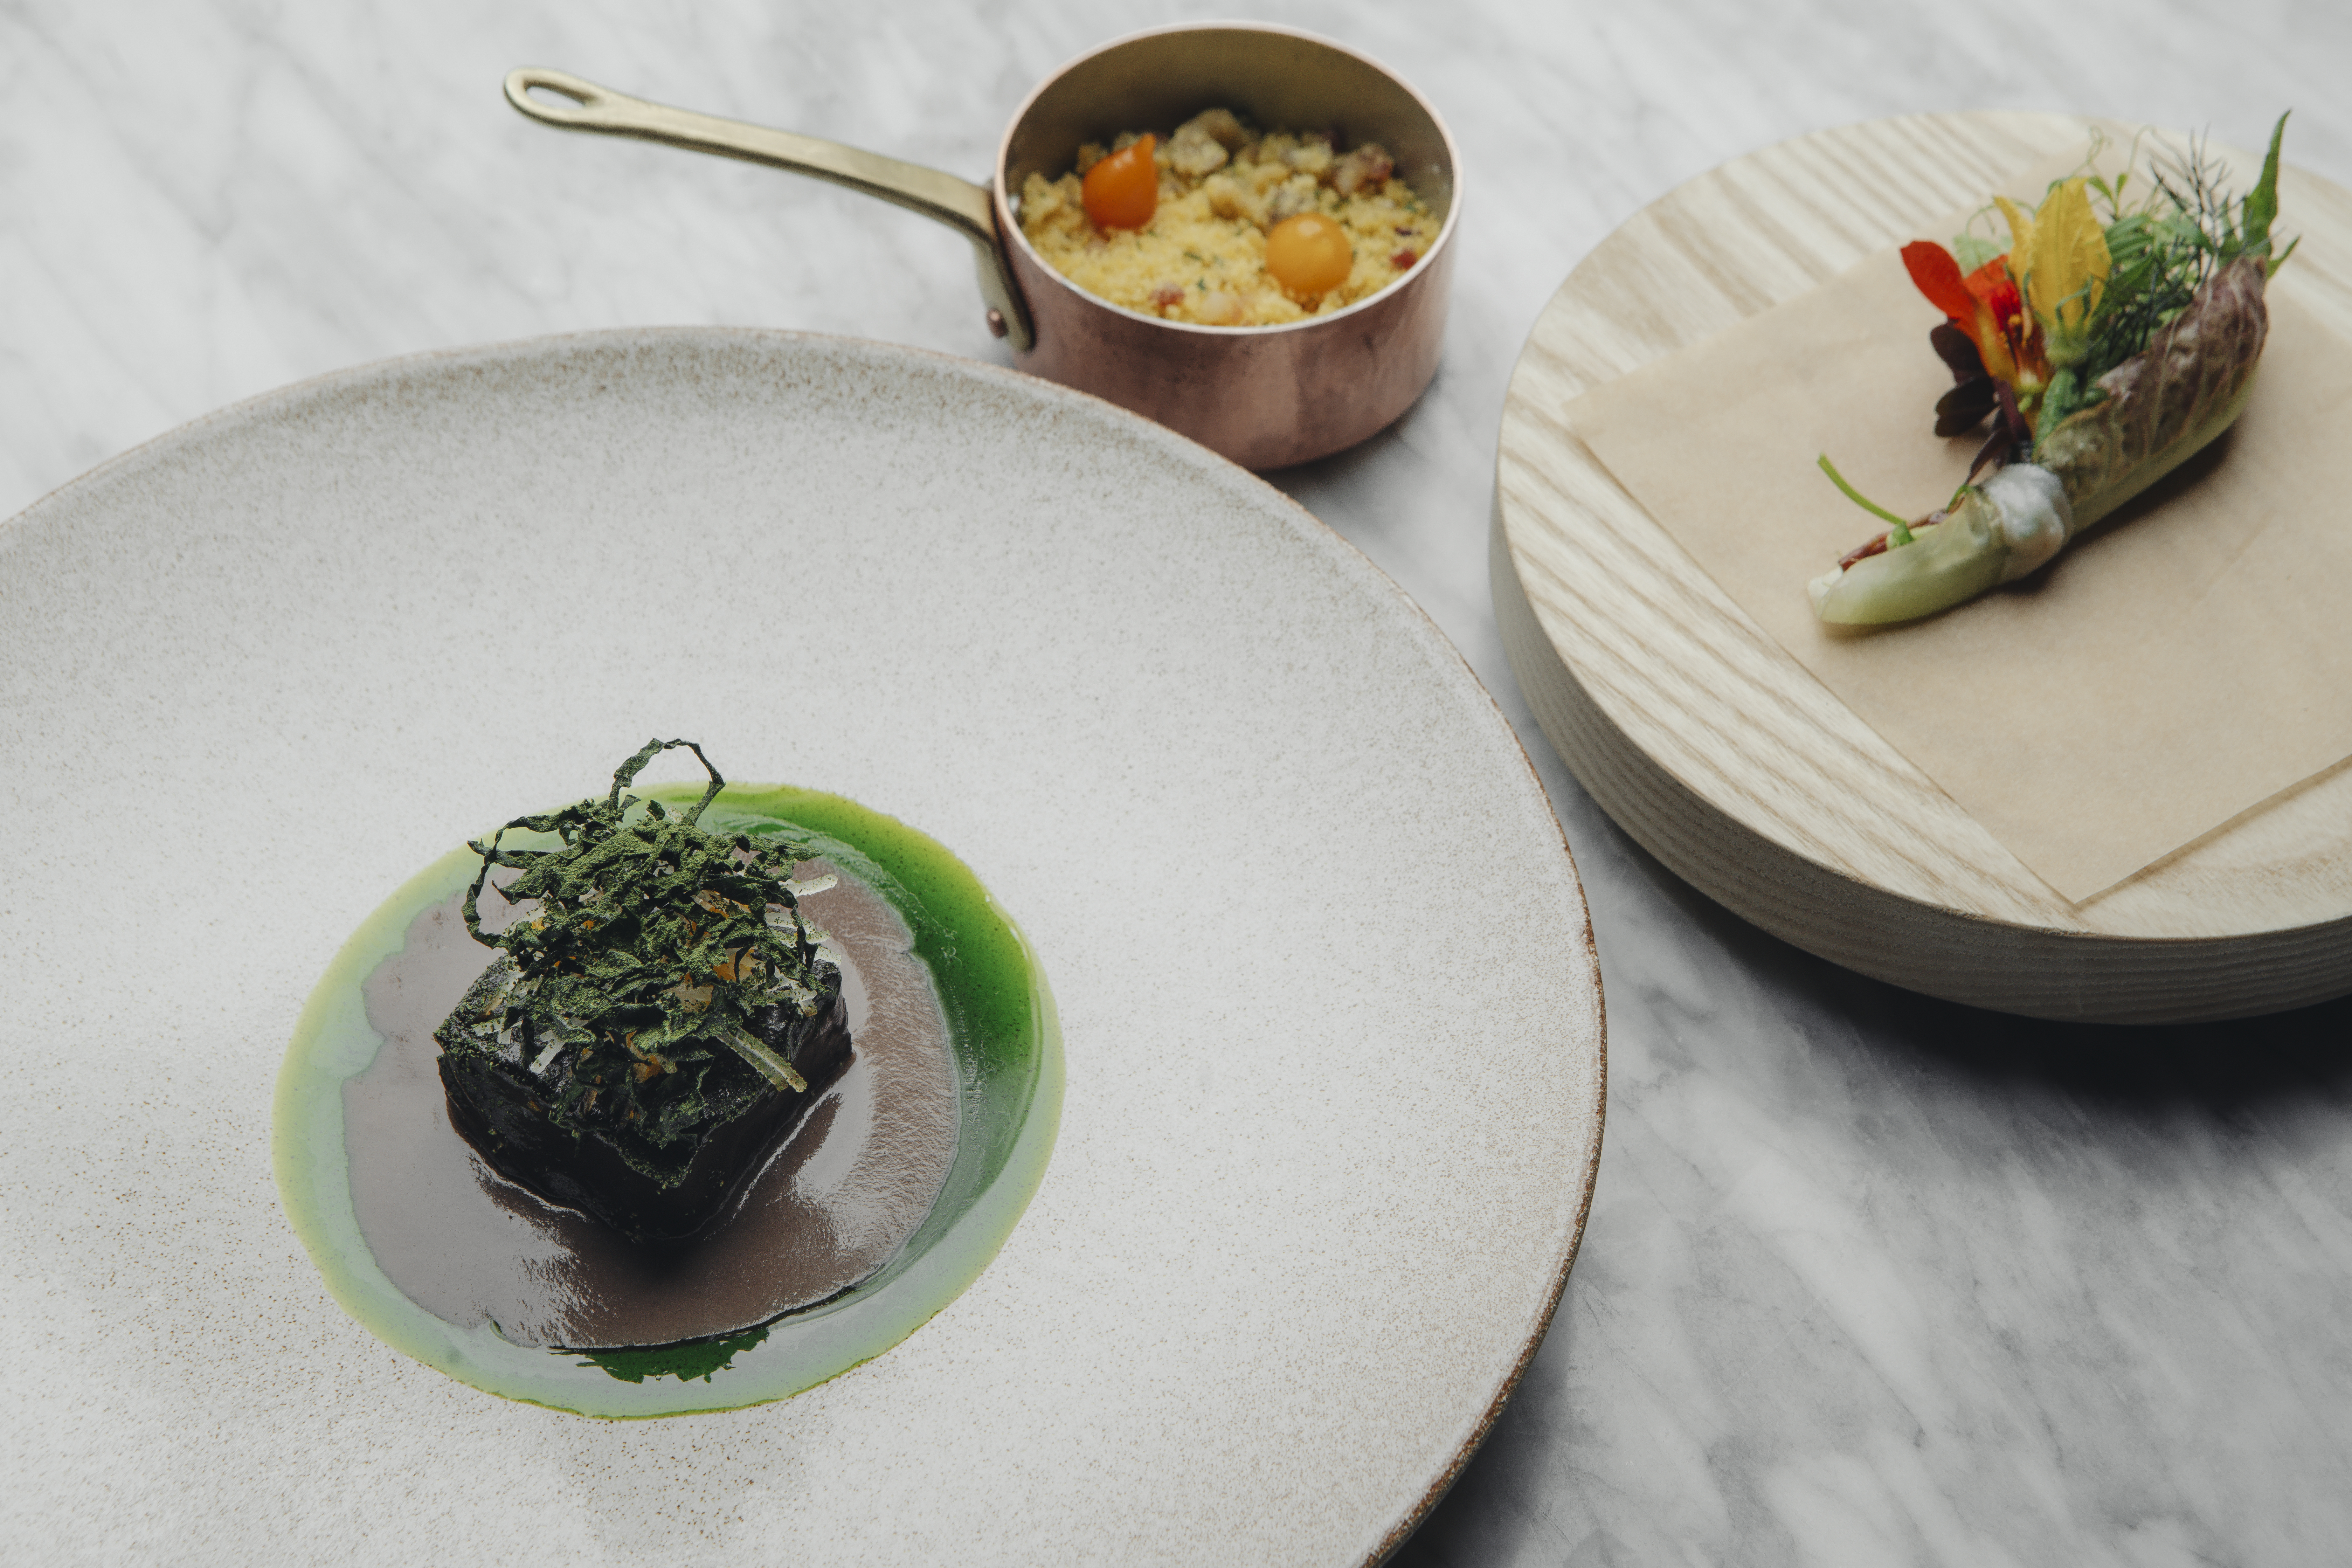 Restaurante Da Terra: Feijoada inspira o prato com cortes de carne de porco e feijão preto, farofa, bacon e banana.